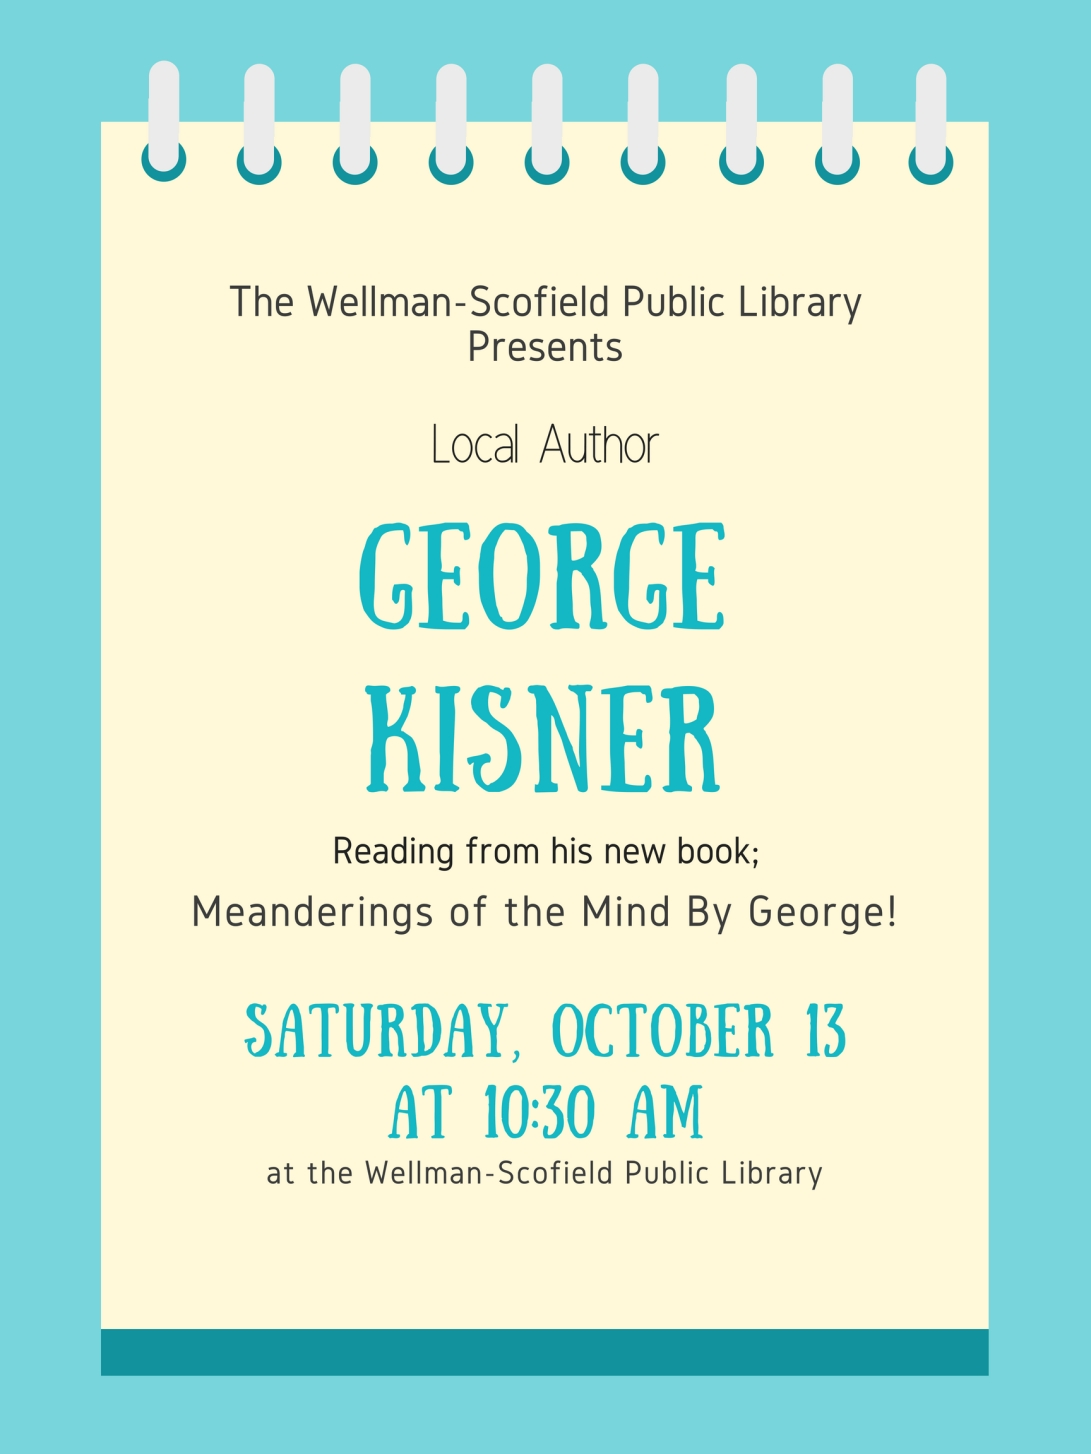 The Wellman-Scofield Public LibraryPresents